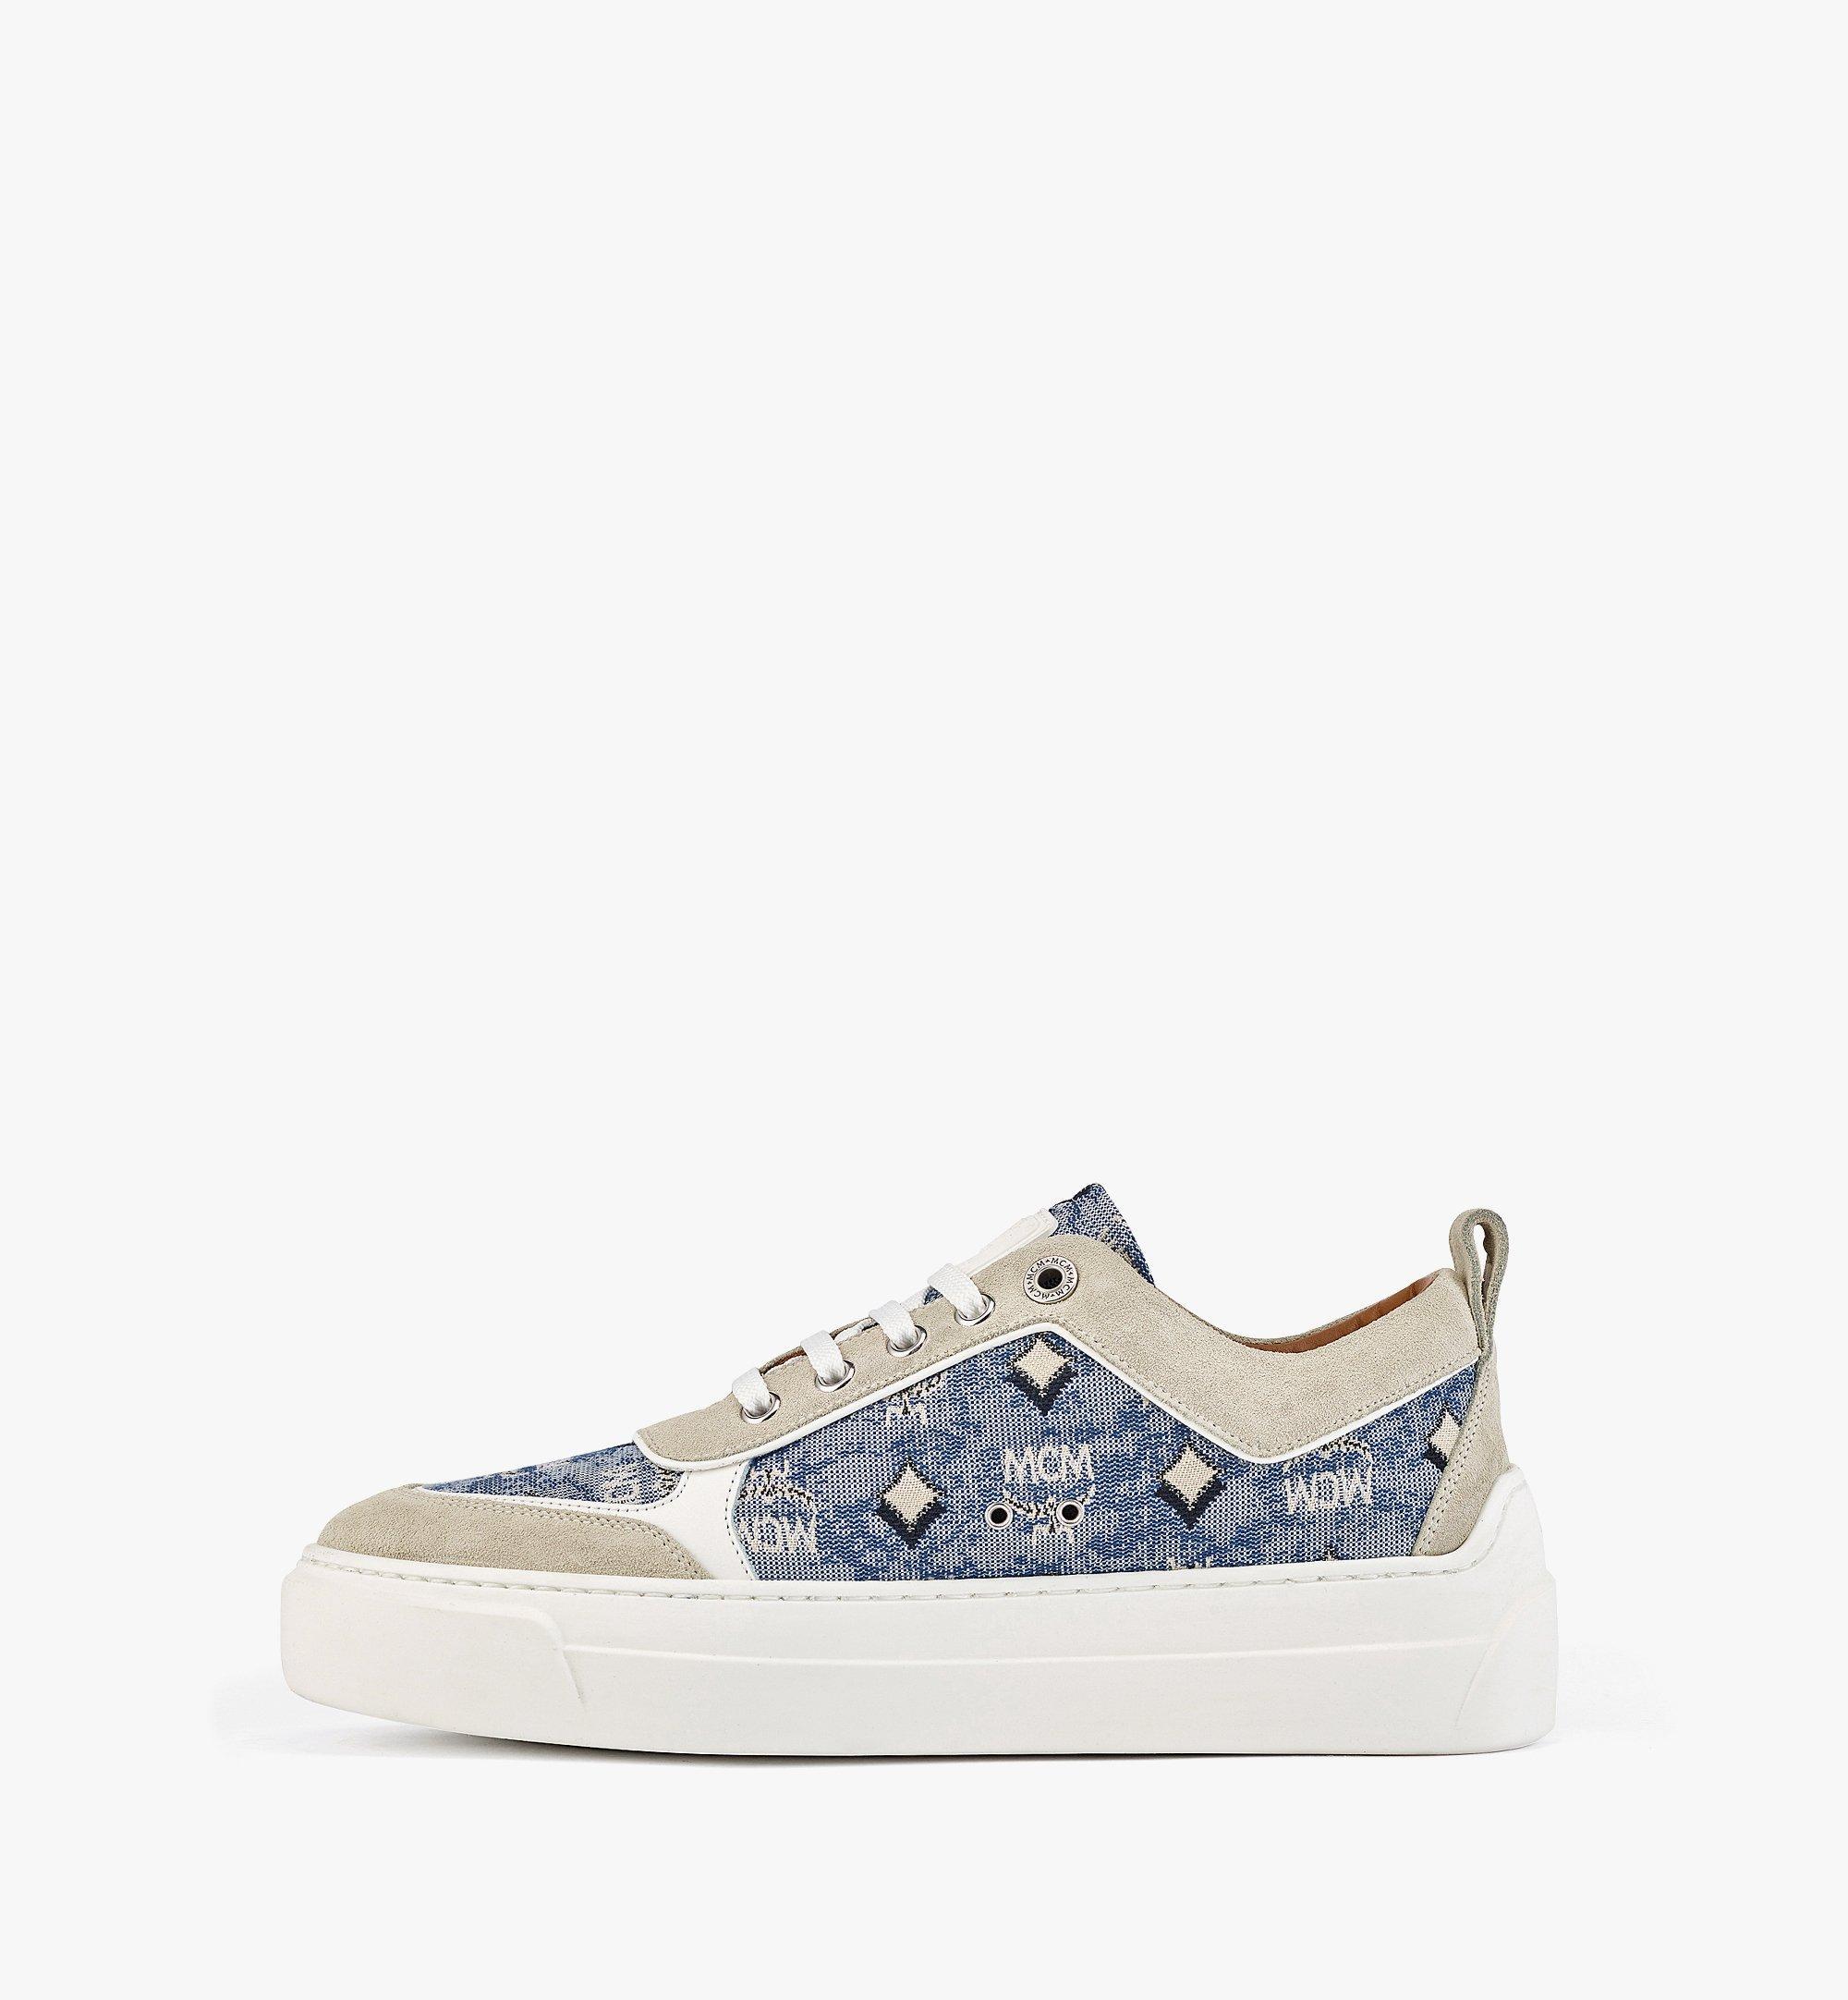 MCM Women's Skyward Platform Sneakers in Vintage Jacquard Monogram Blue MESBATQ03LU037 Alternate View 1